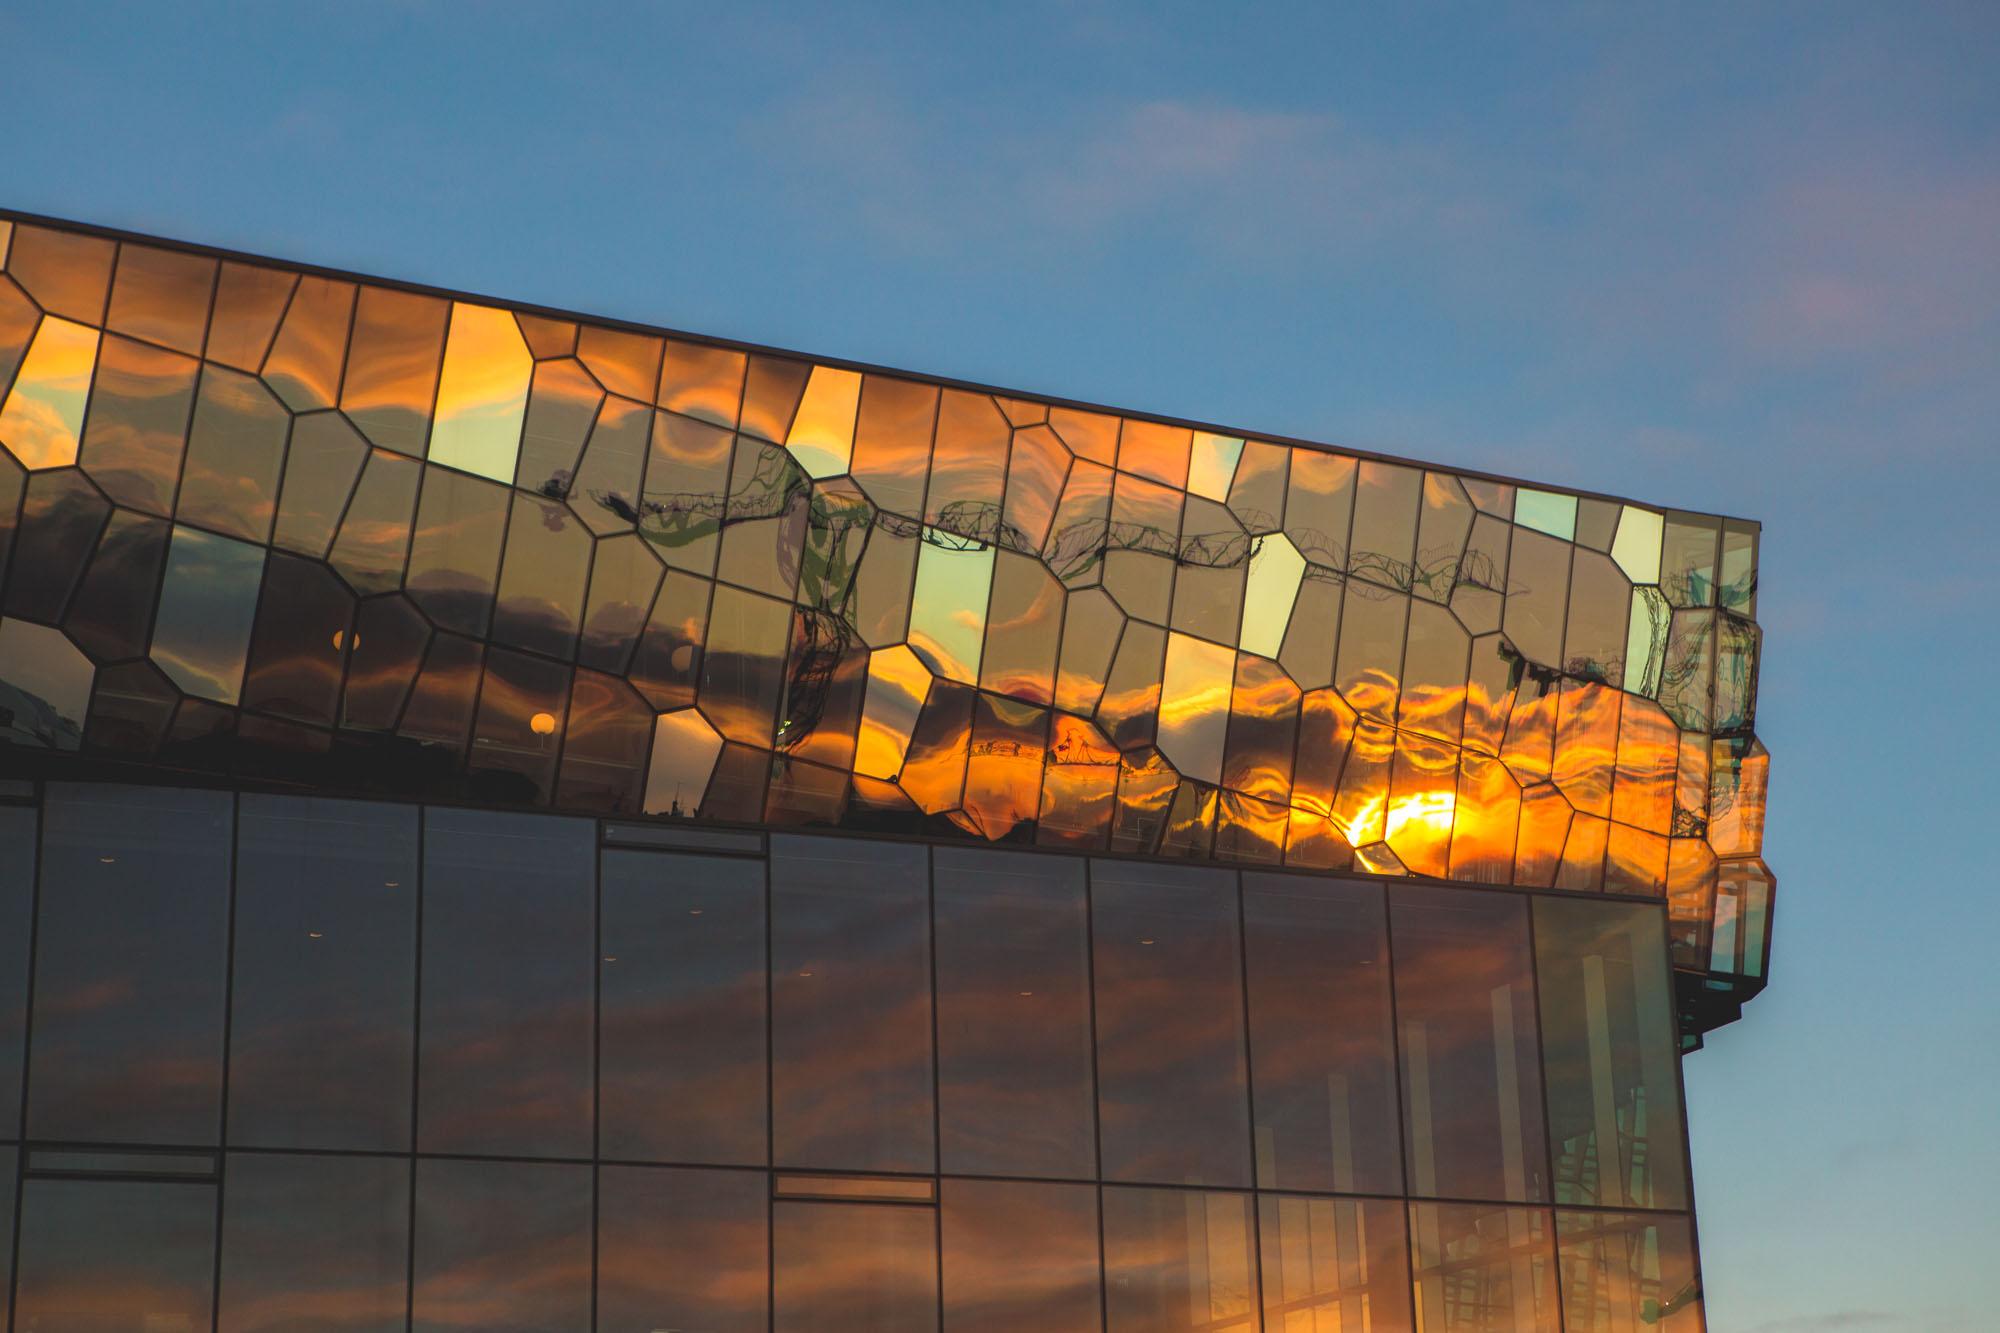 Iceland photo inspiration – Reykjavik